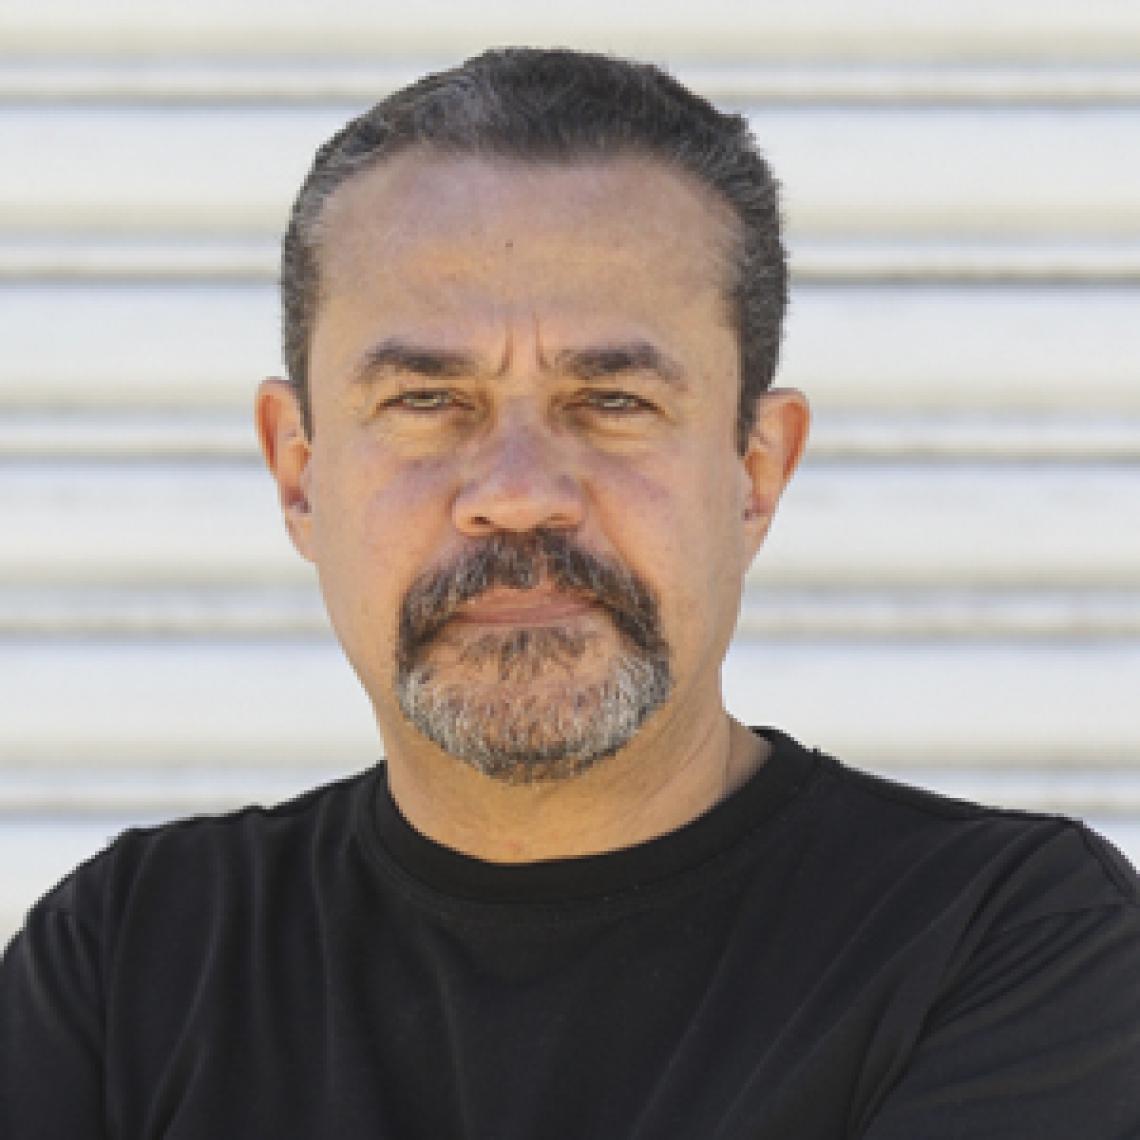 Romeu Duarte